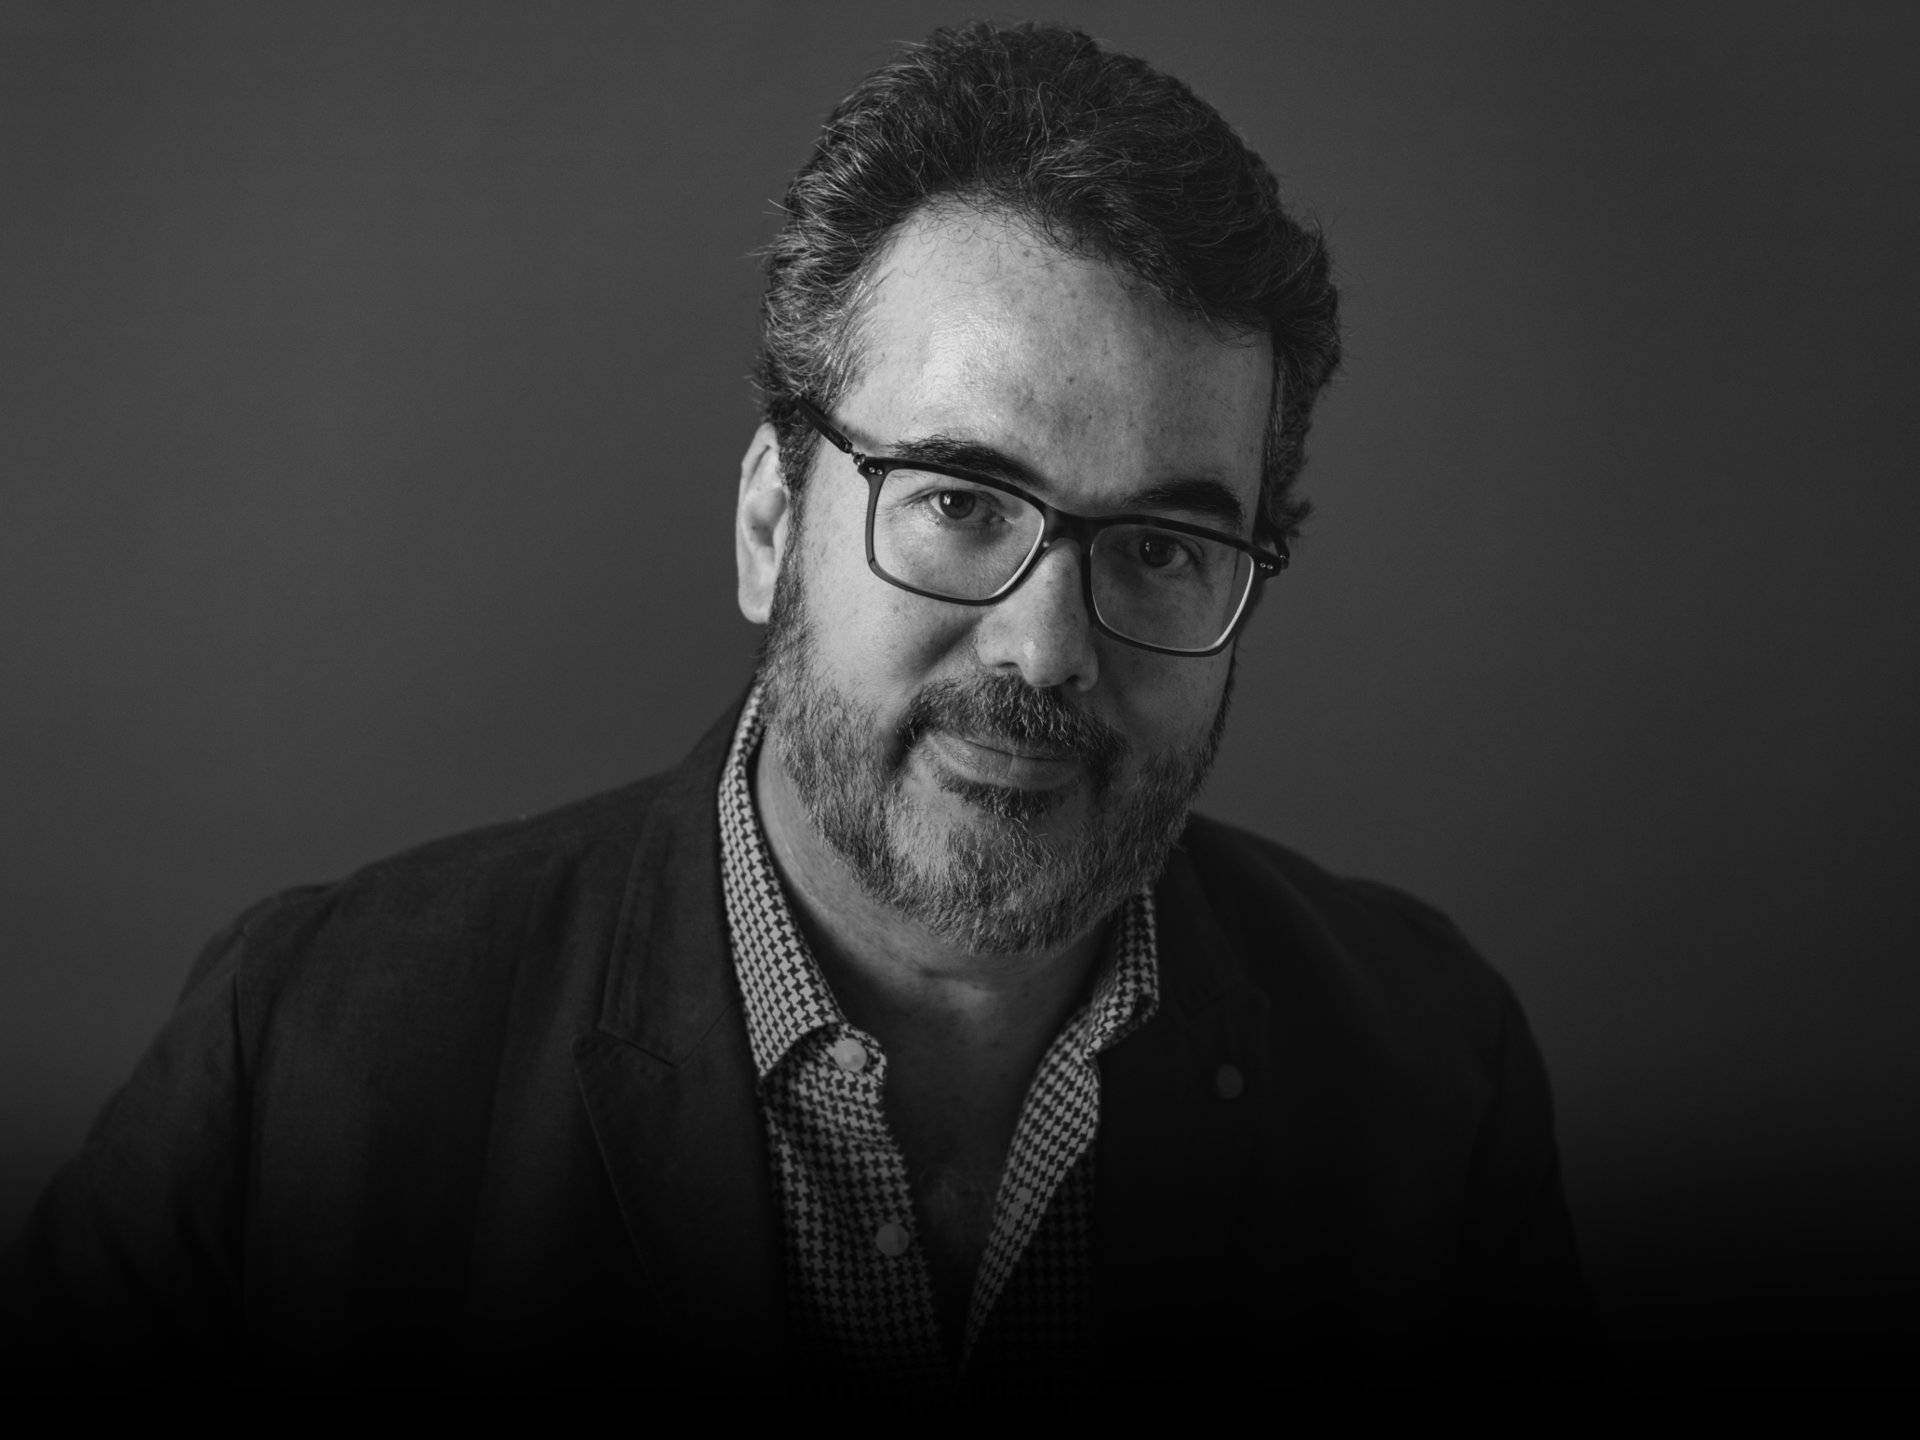 Image of Marco Zermeño